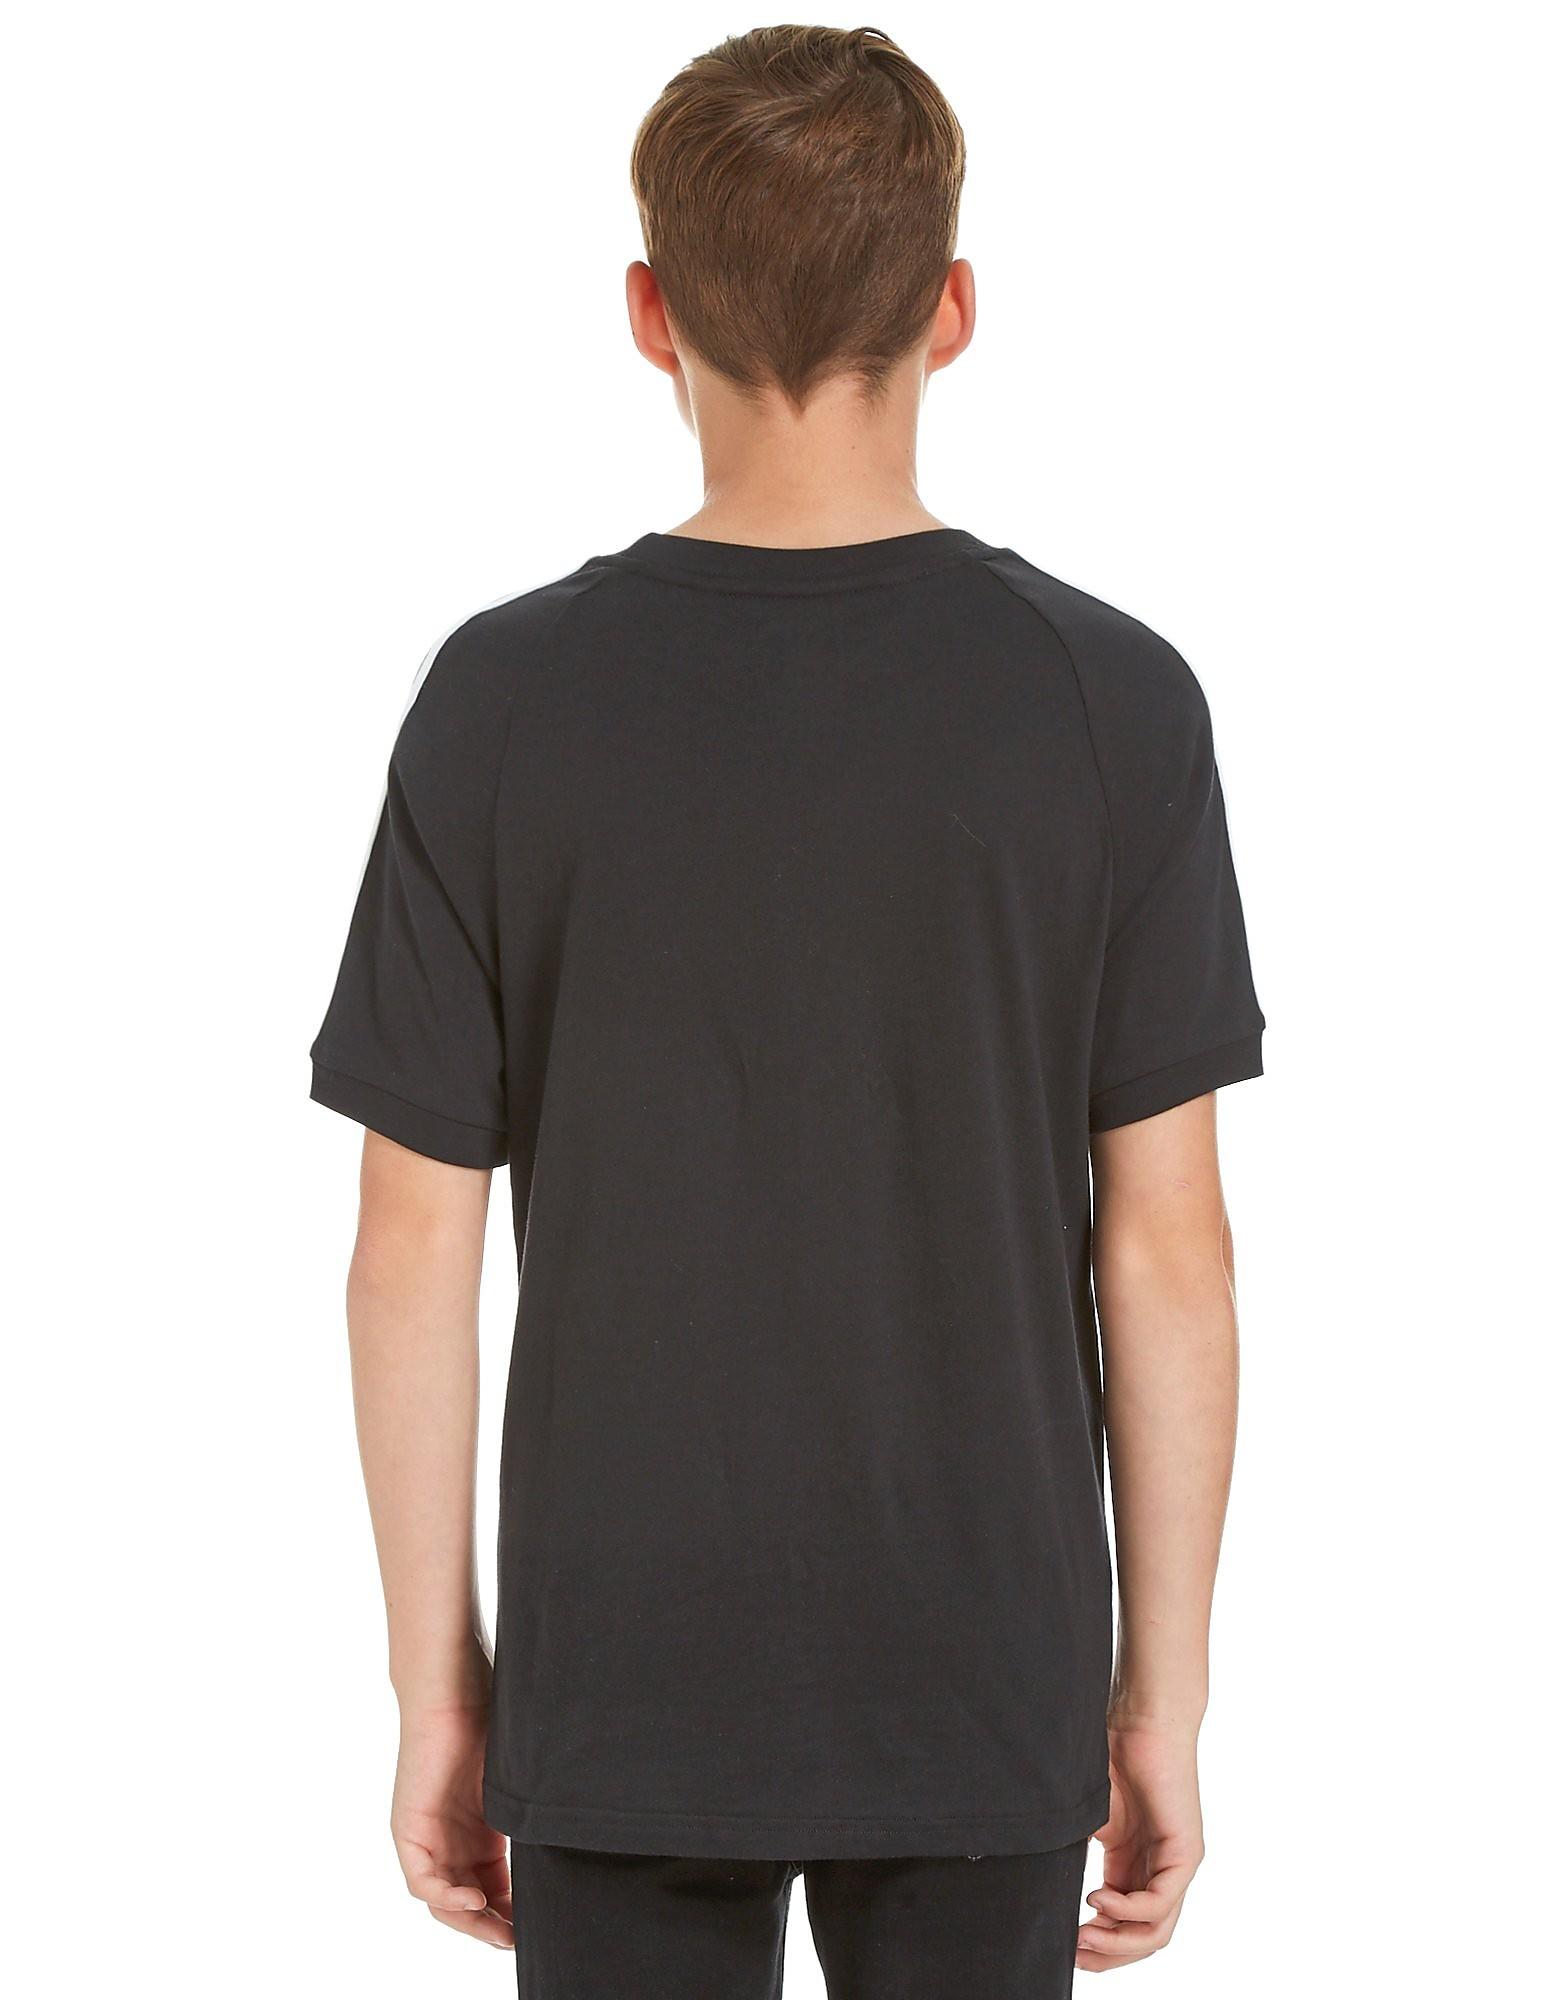 adidas Originals California T-Shirt Junior